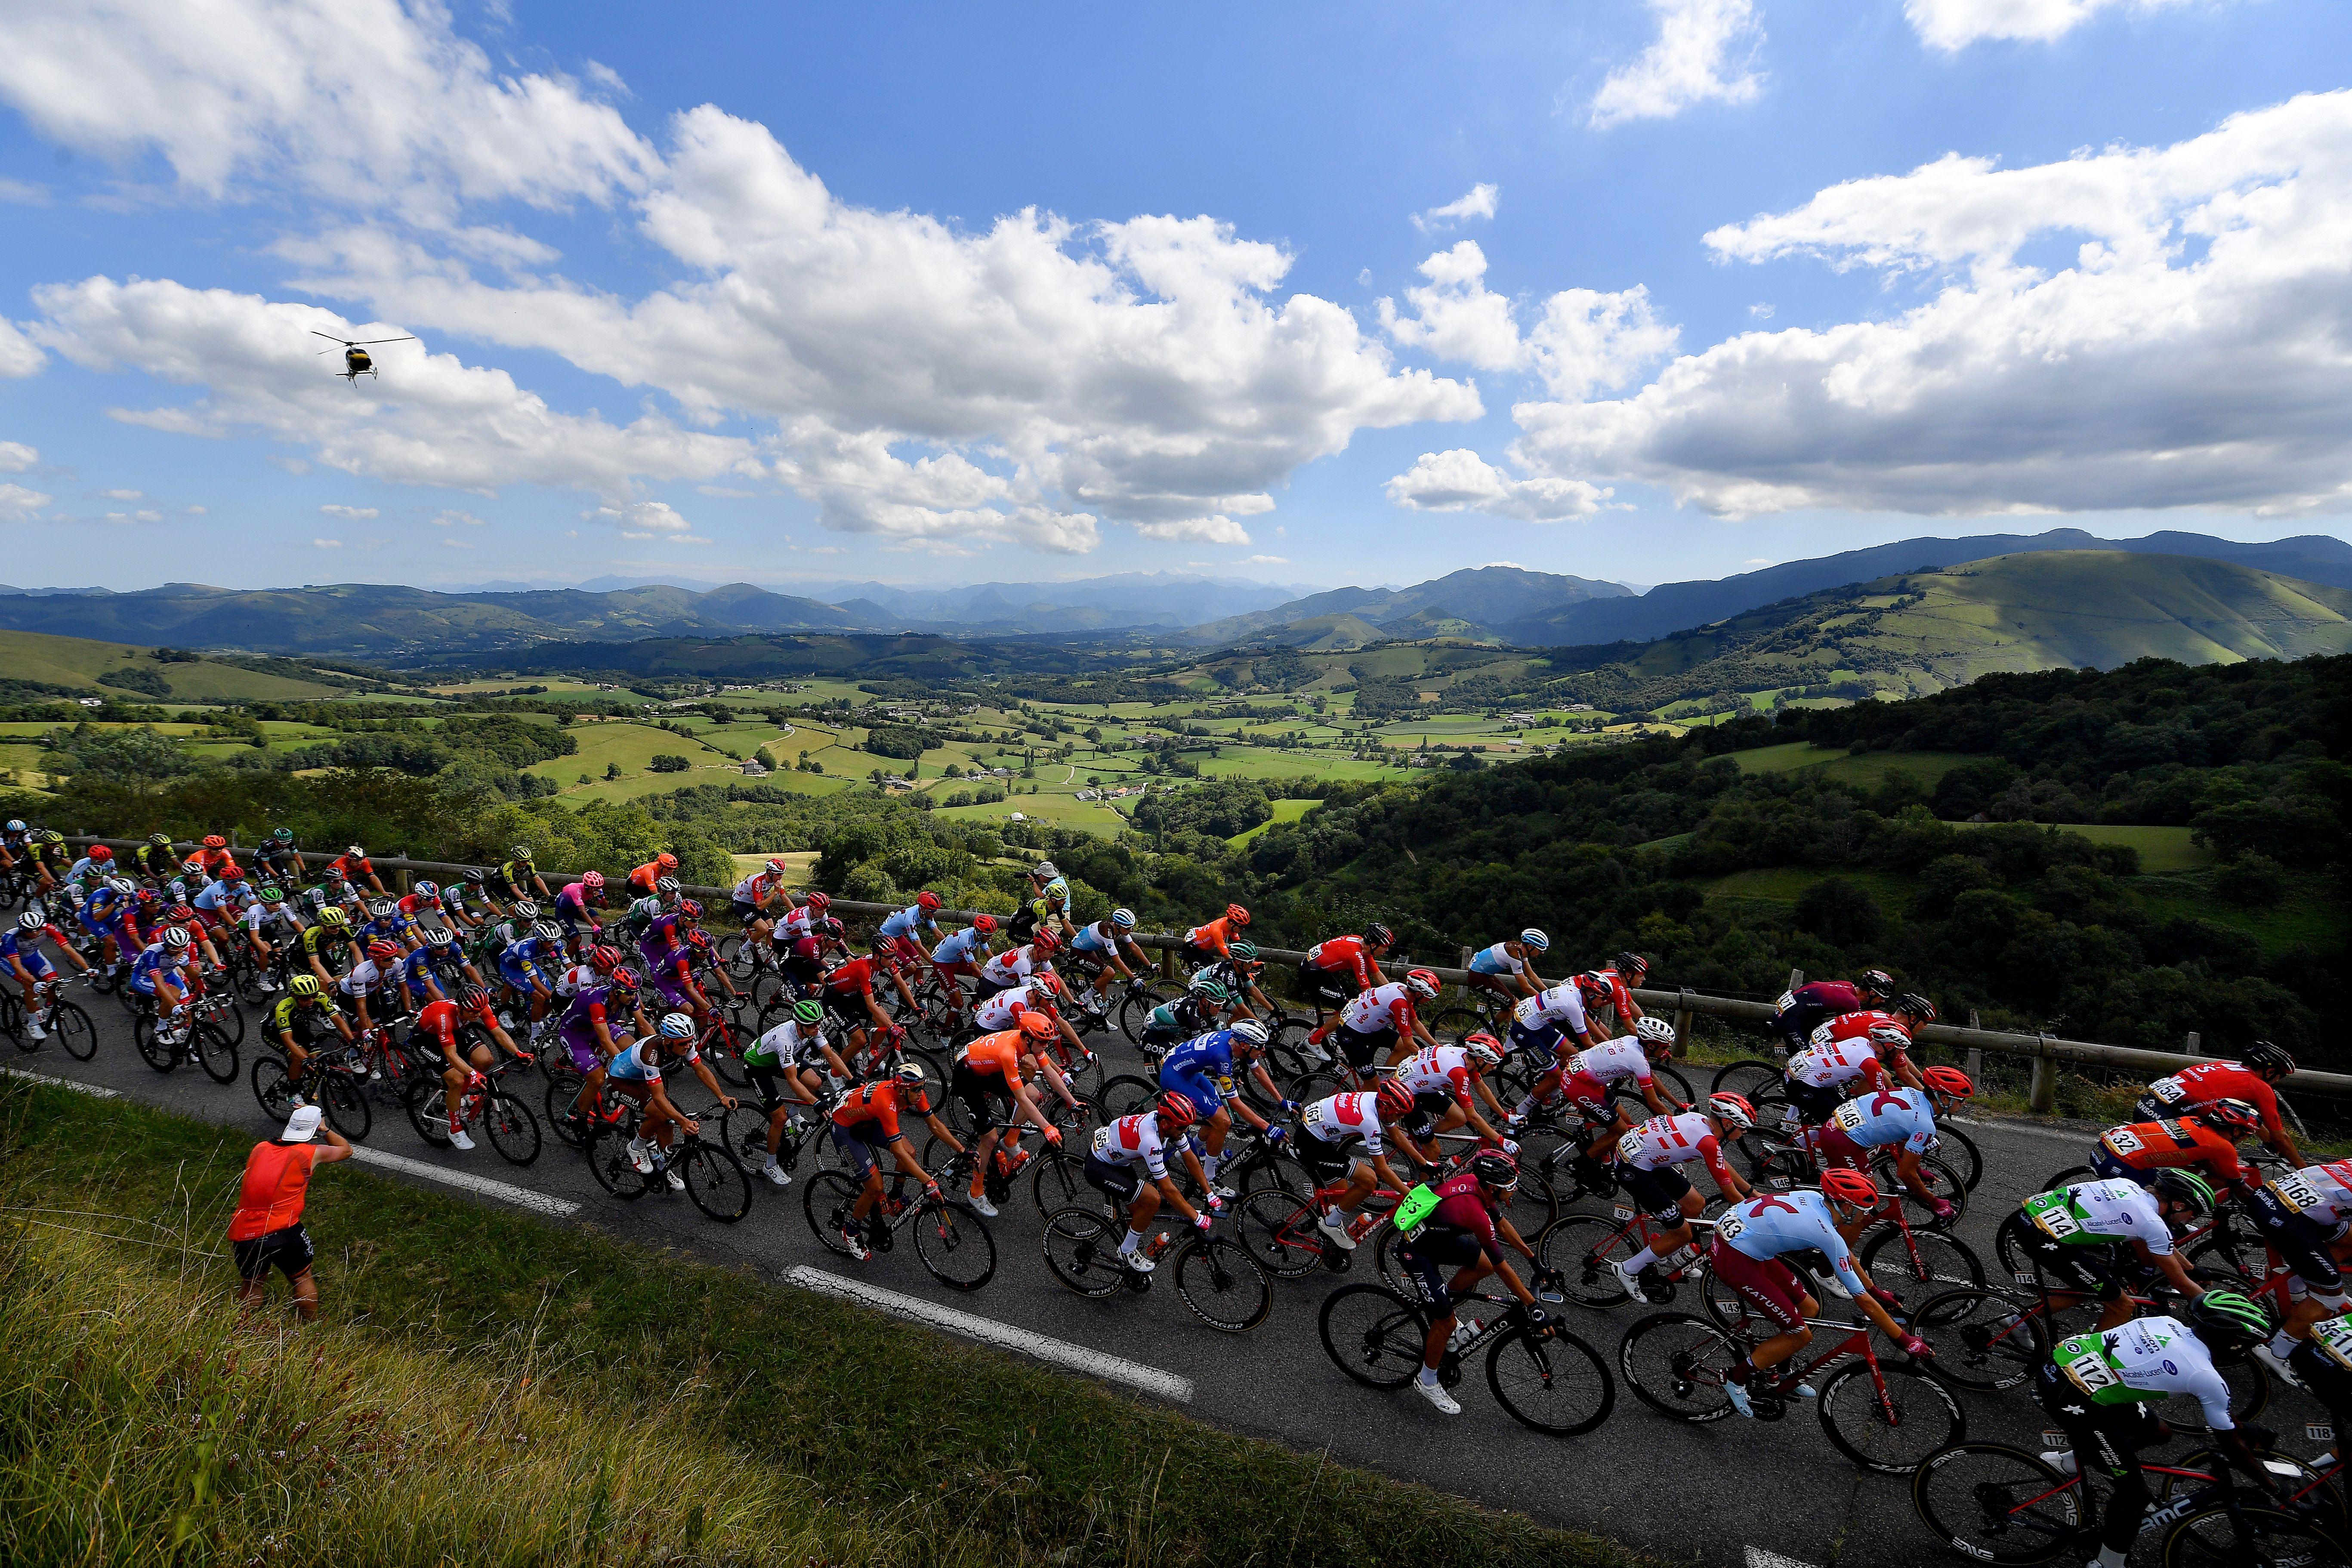 Cyclists riding through Spain